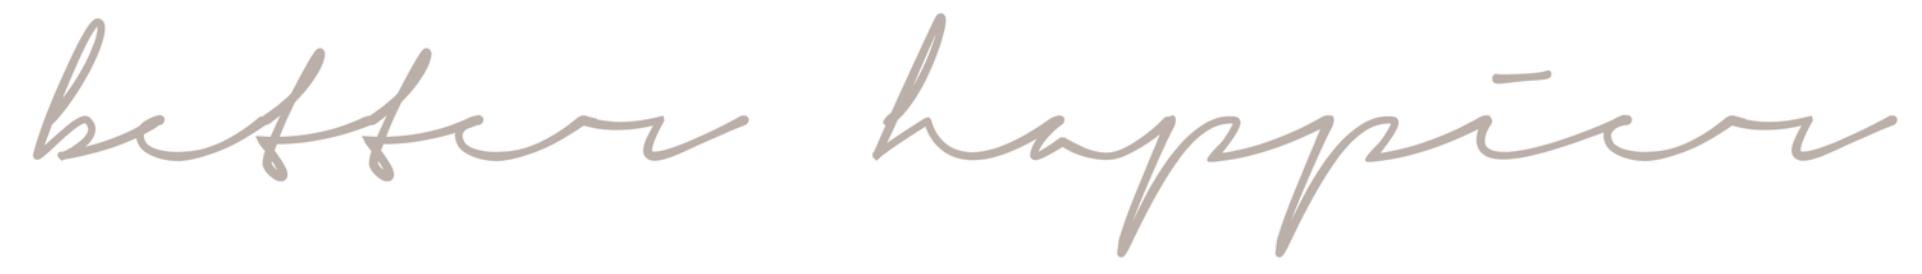 better happier logo